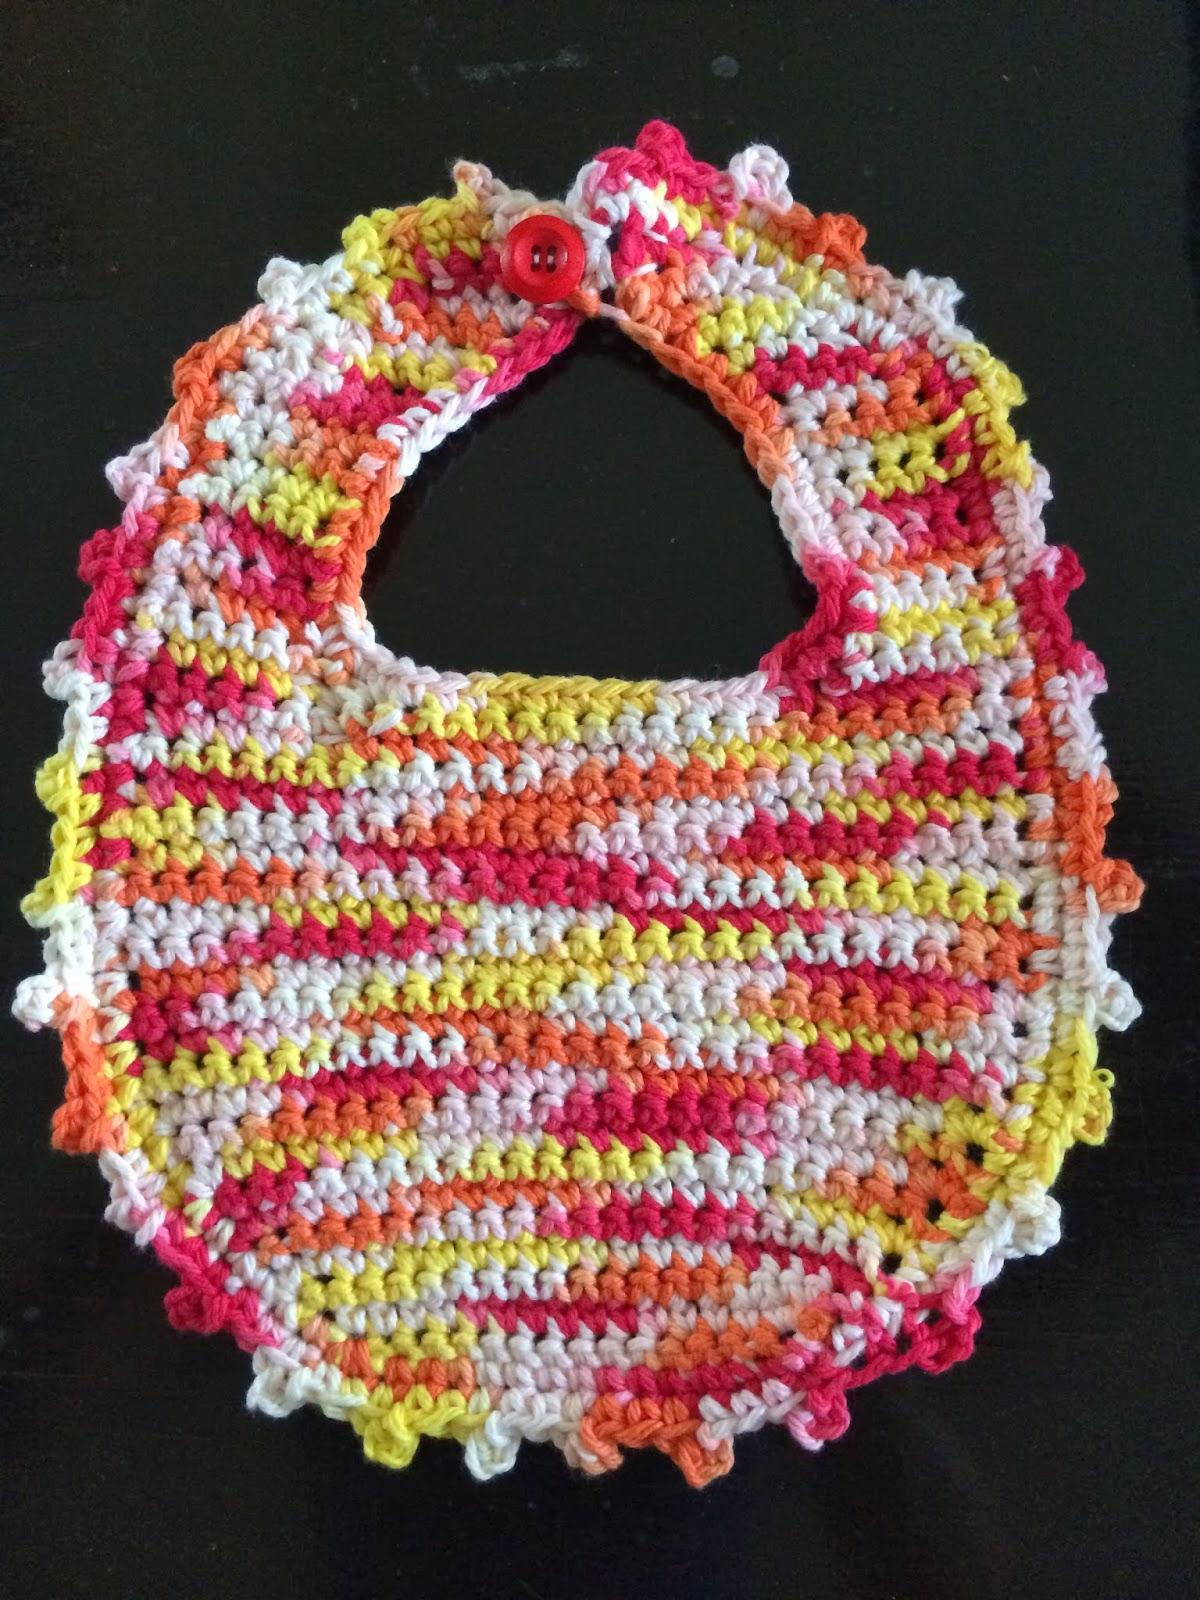 Crochet Picot Stitch Baby Bib - Free Pattern | Not My Nana\'s Crochet!